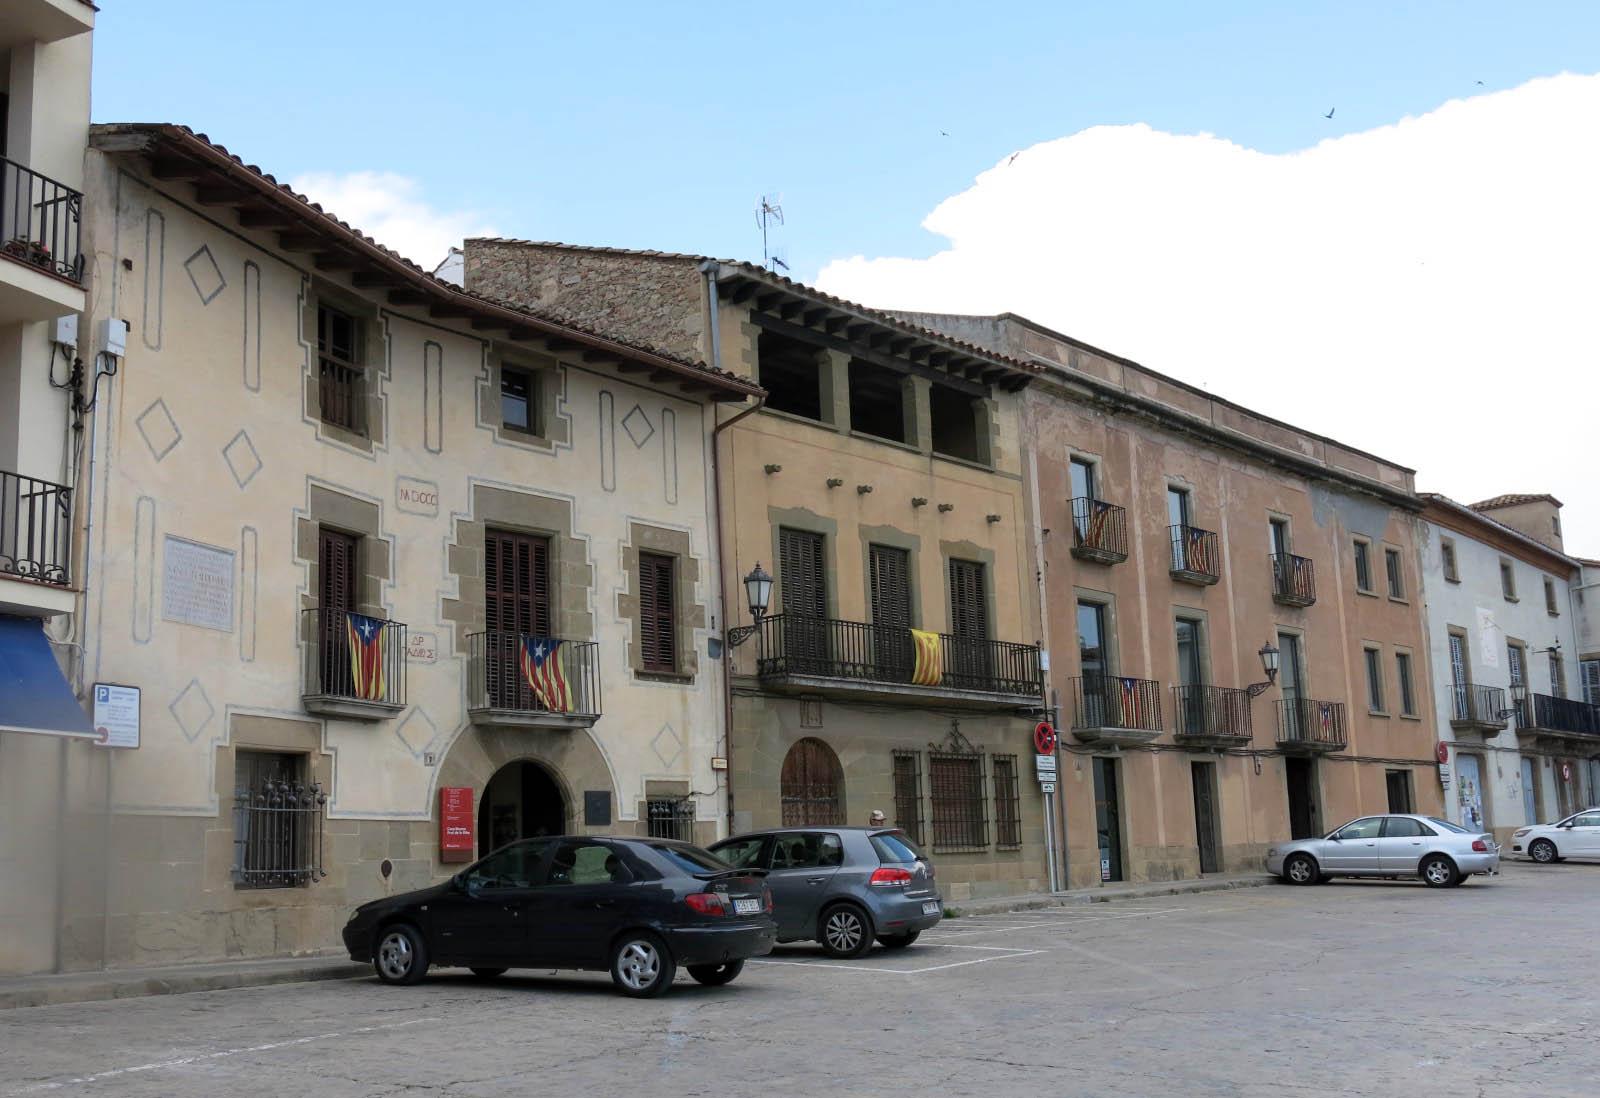 ZCatell Plaça Prat de la Riba